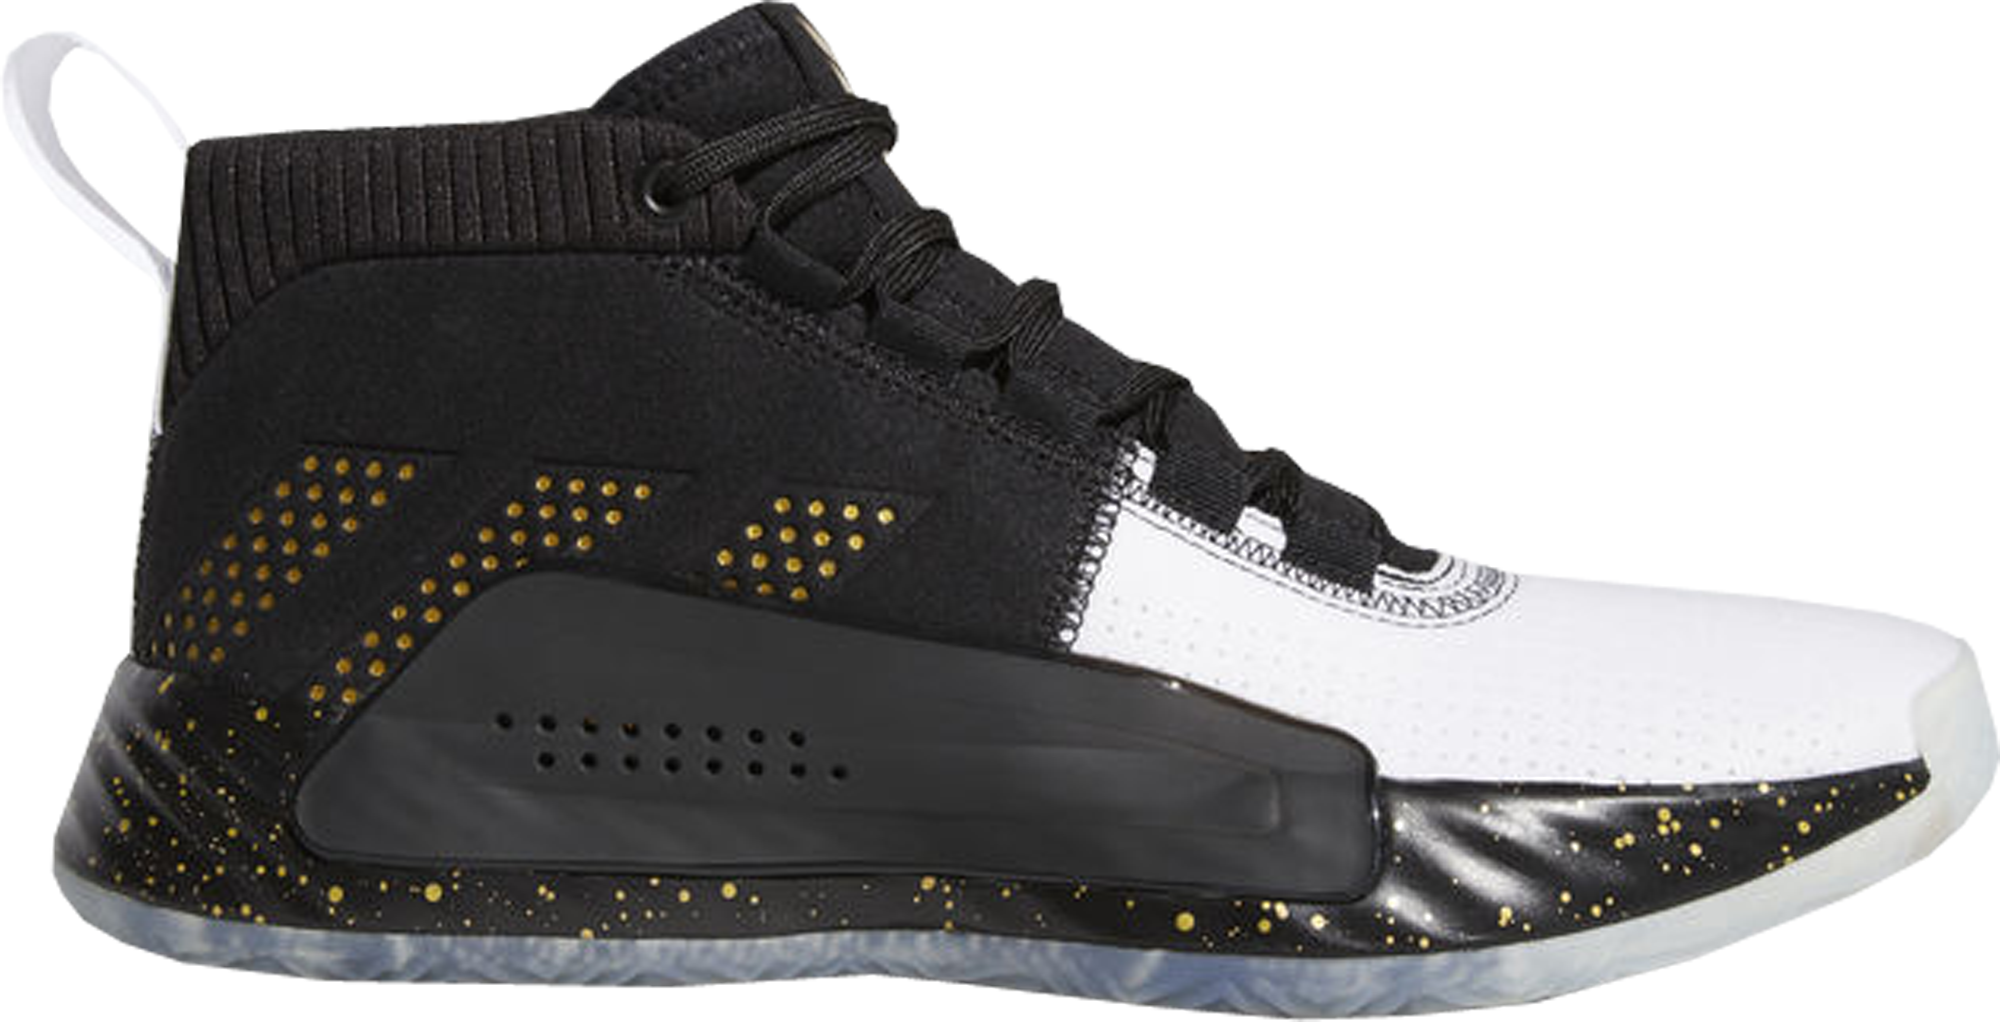 adidas Dame 5 Black Gold White - G28821